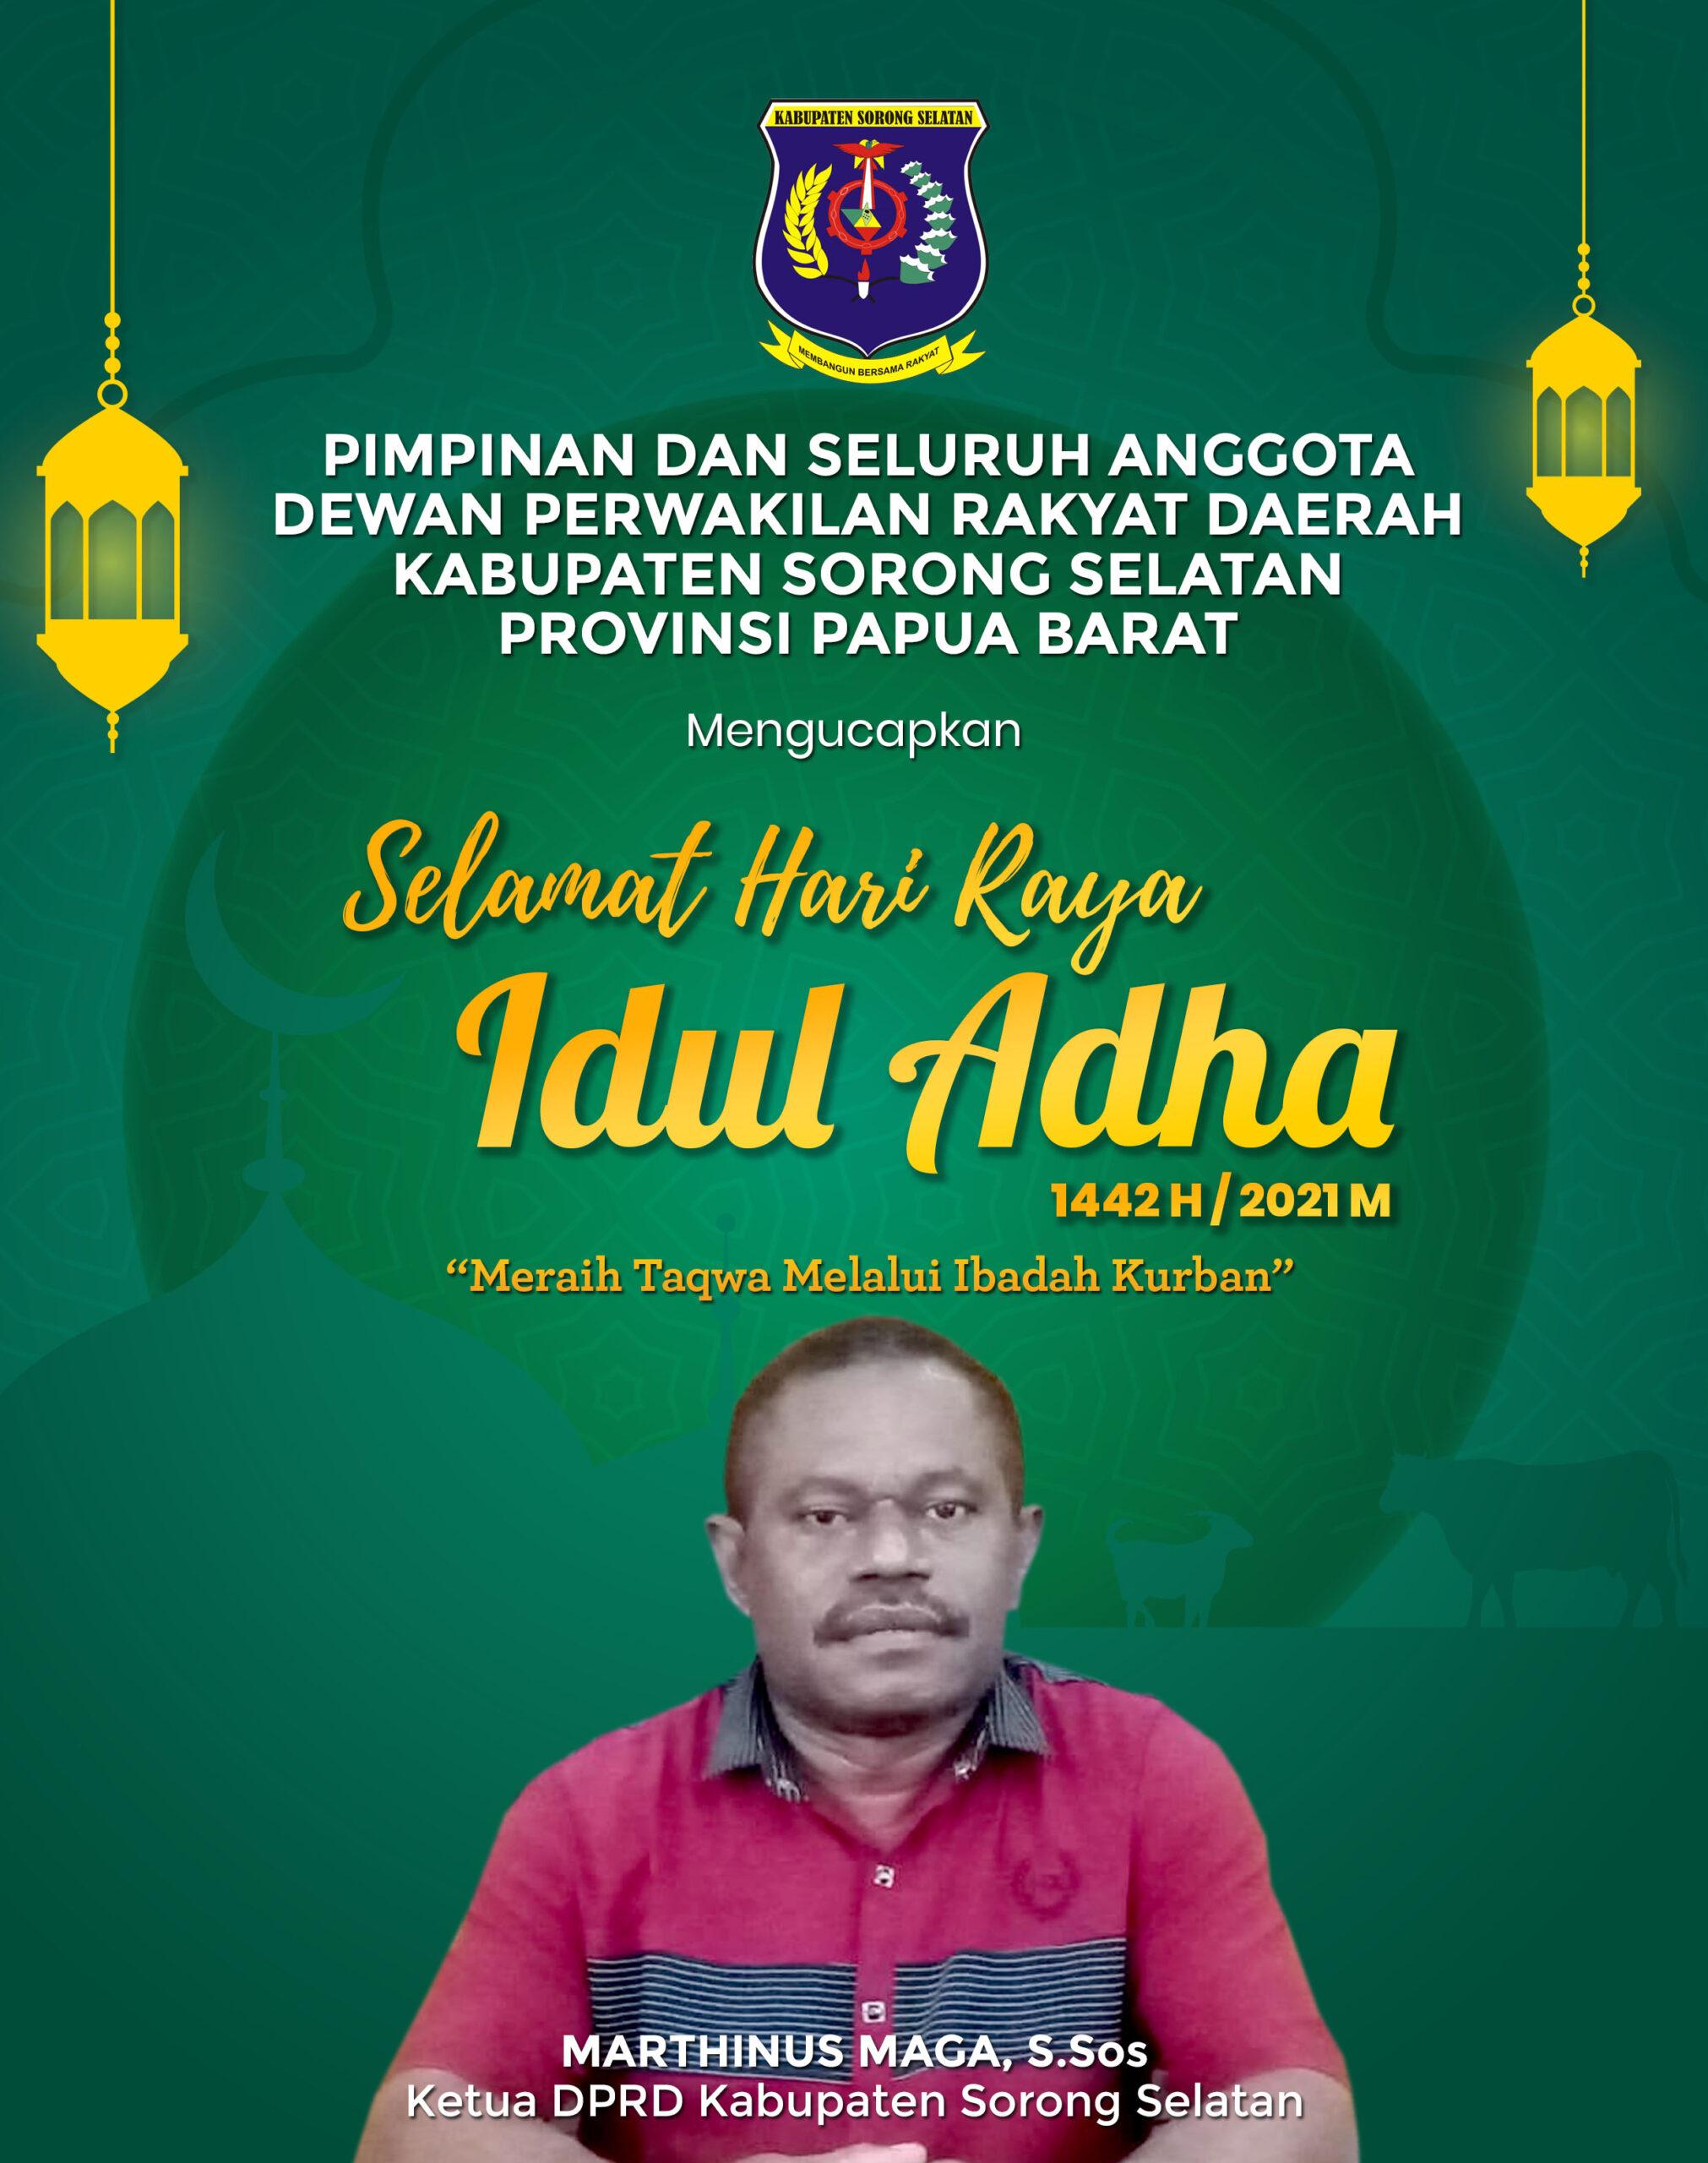 Ketua DPRD Kabupaten Sorong Selatan-ADHA 2021